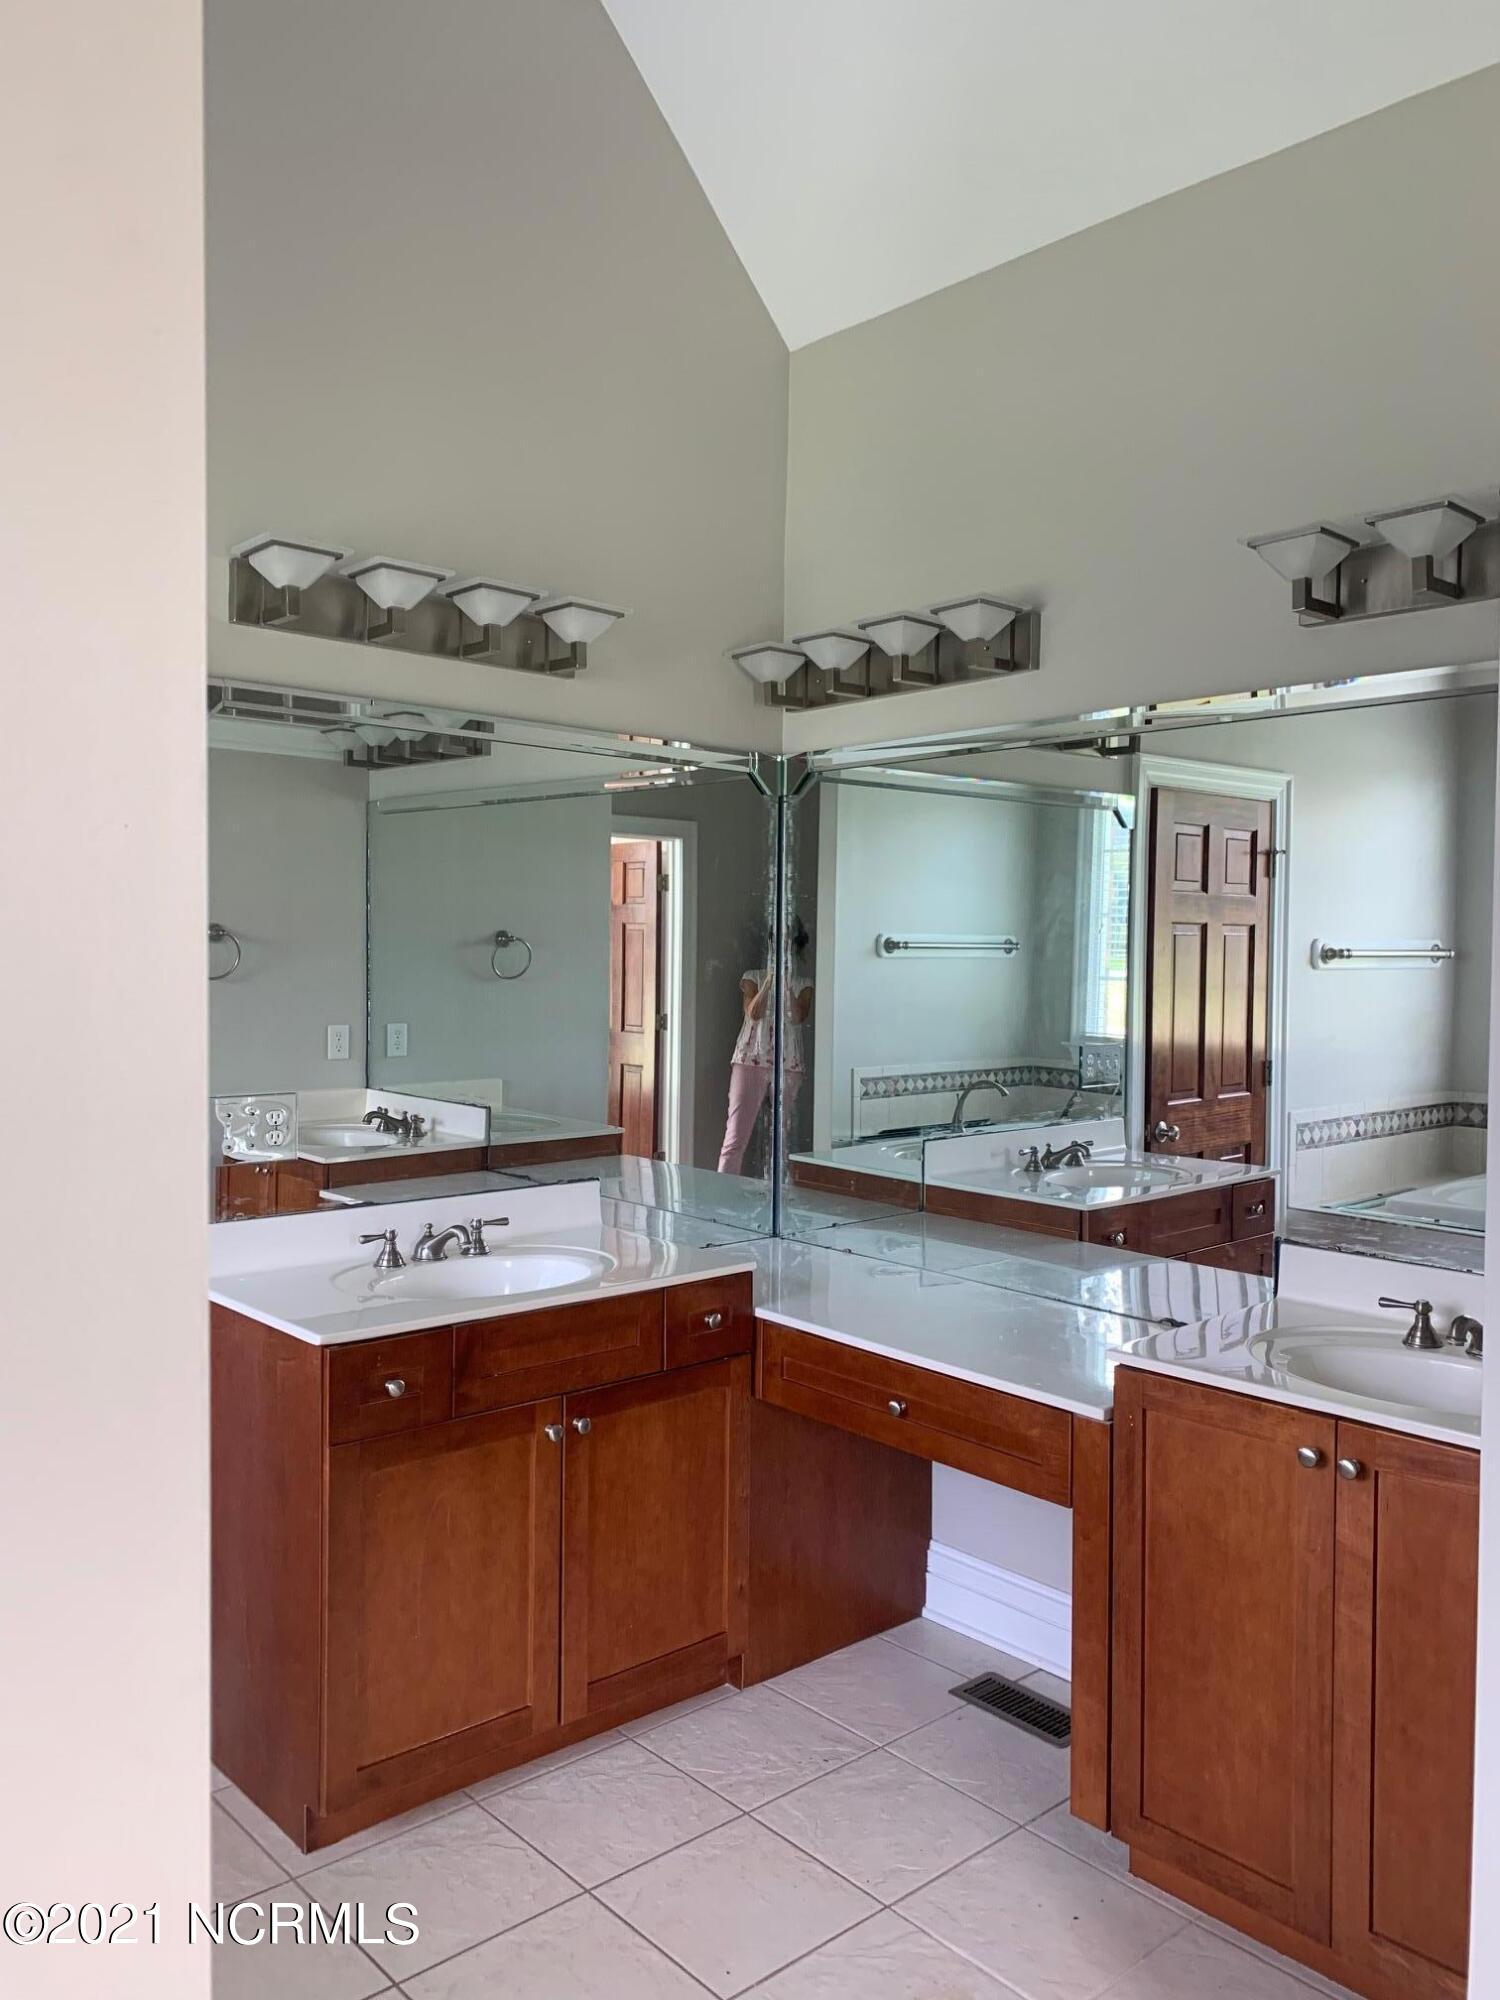 216 River Branch Road, Greenville, North Carolina 27858, 3 Bedrooms Bedrooms, 10 Rooms Rooms,2 BathroomsBathrooms,Single family residence,For sale,River Branch,100286300